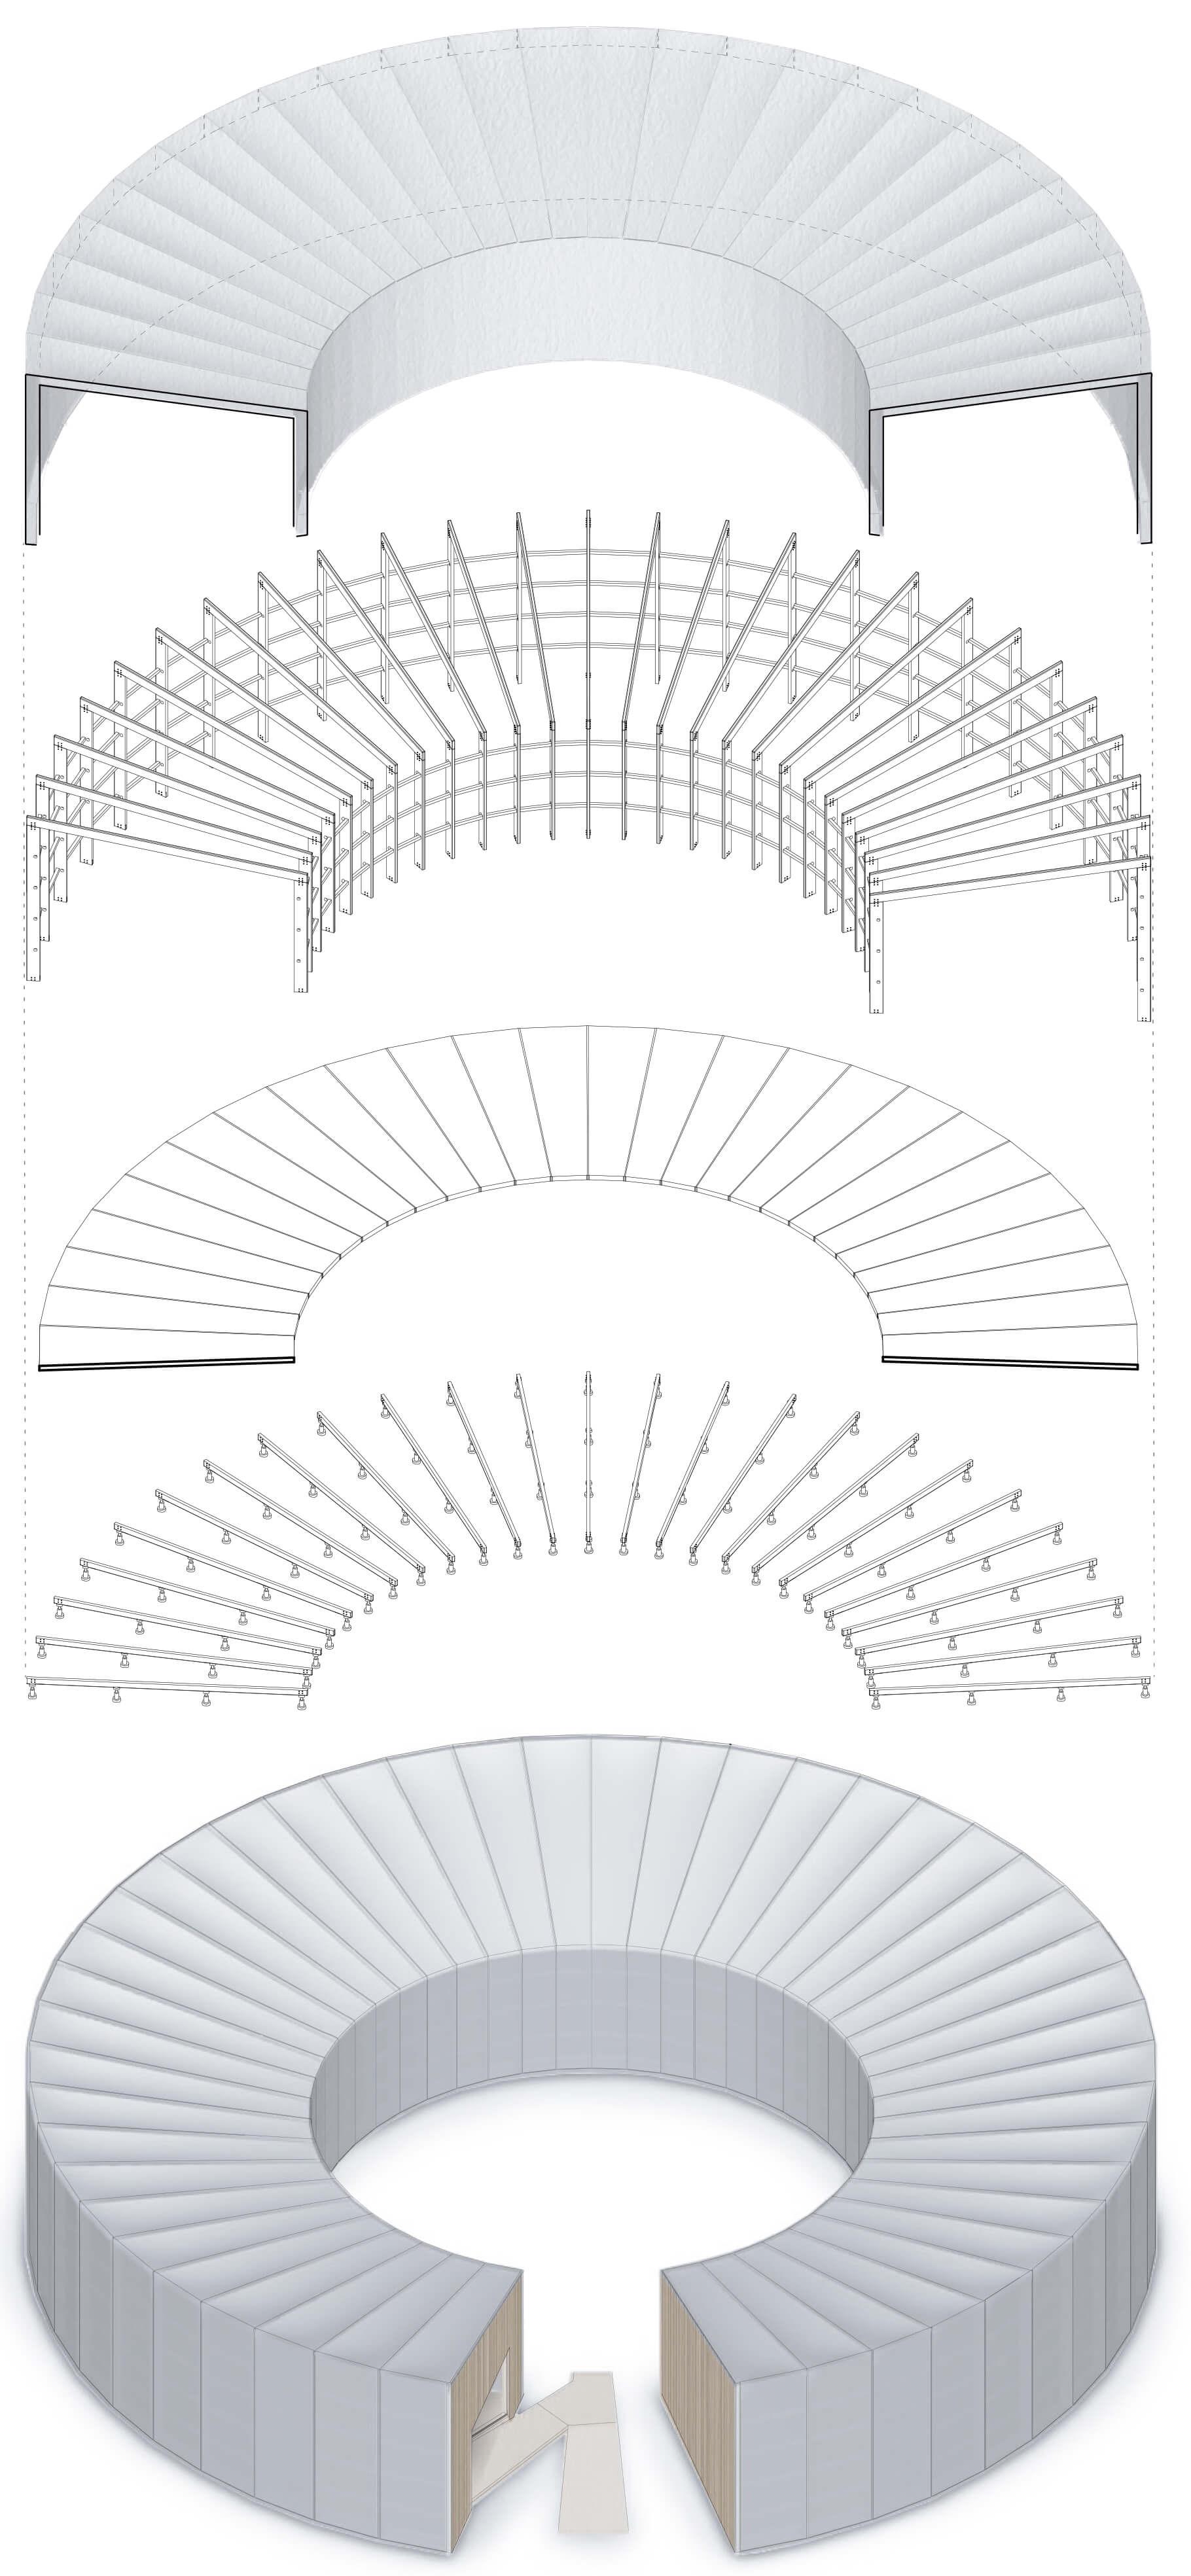 Axonometria_sintese das componentes construtivas